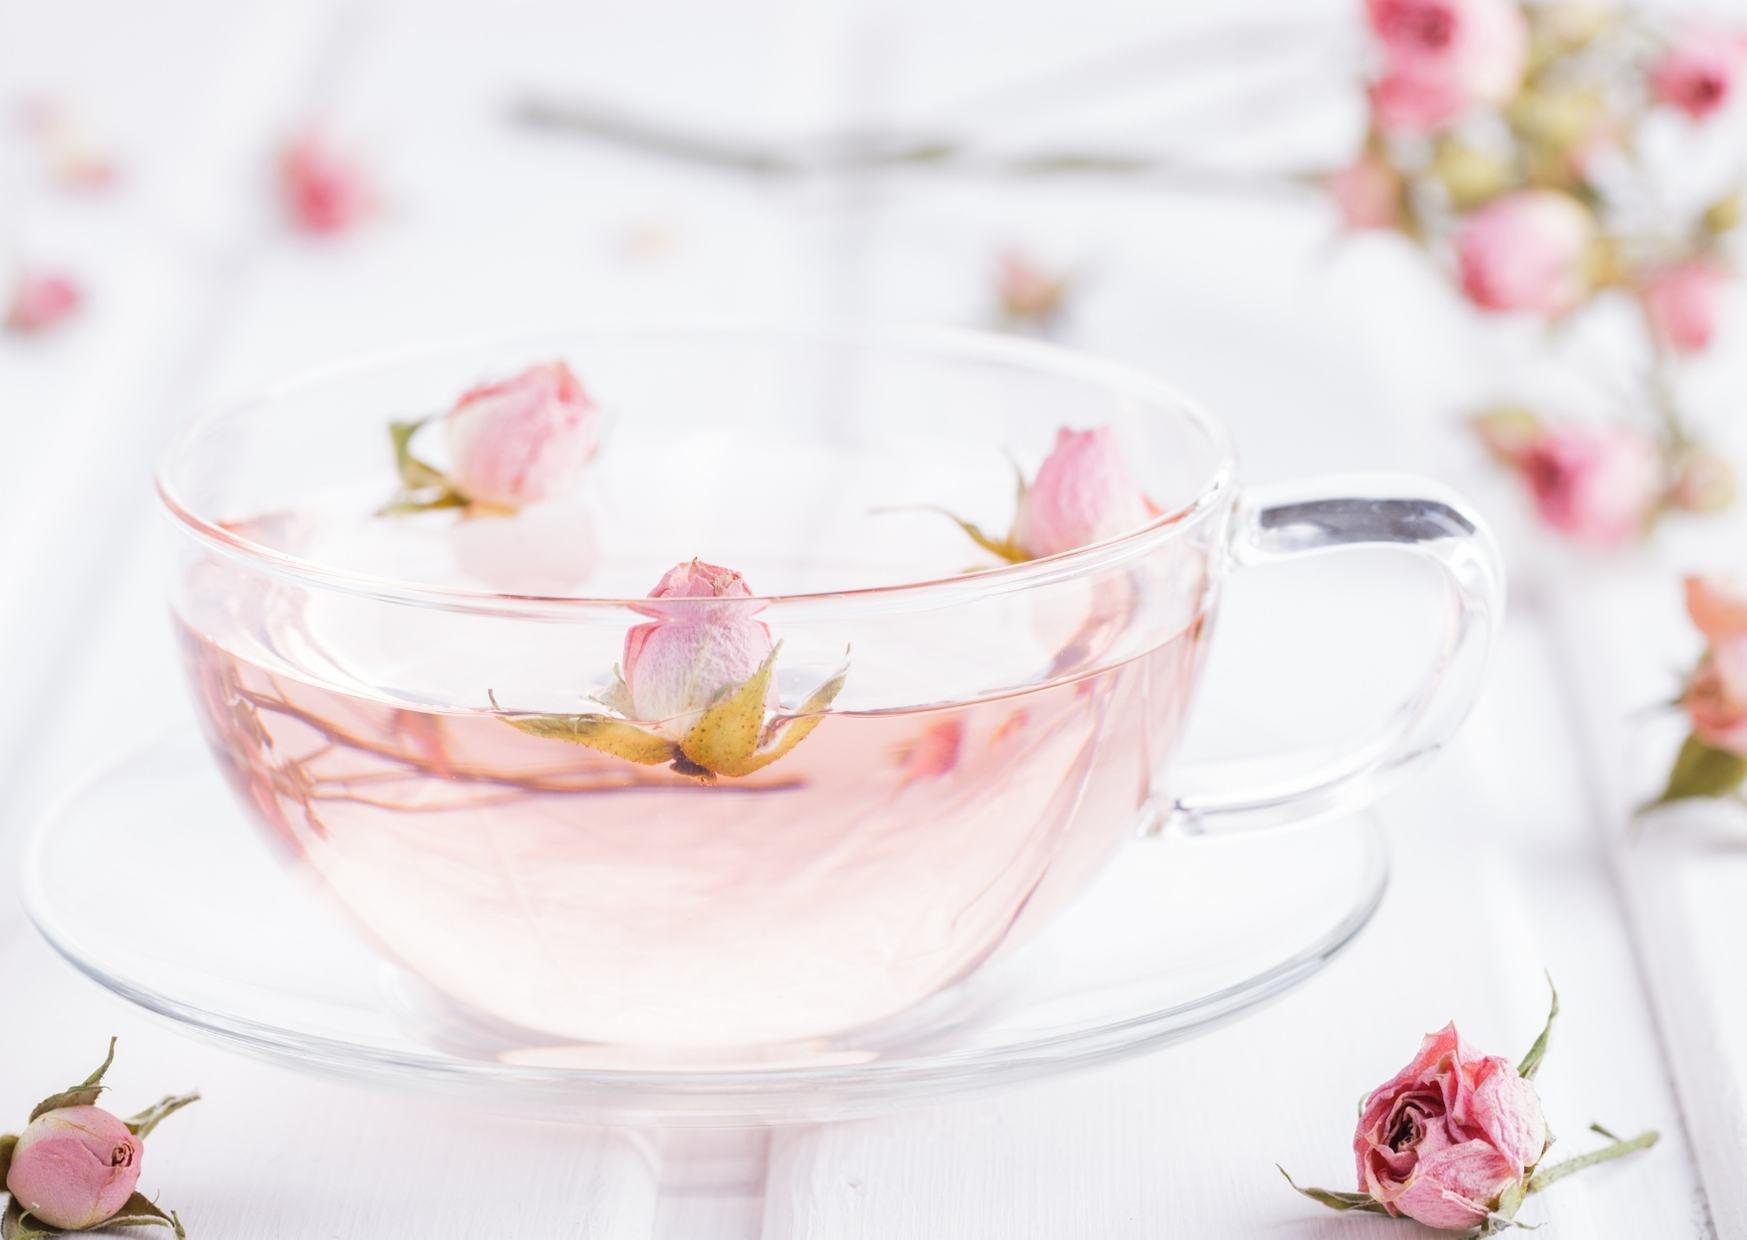 Rosa Damascena Flower Tea